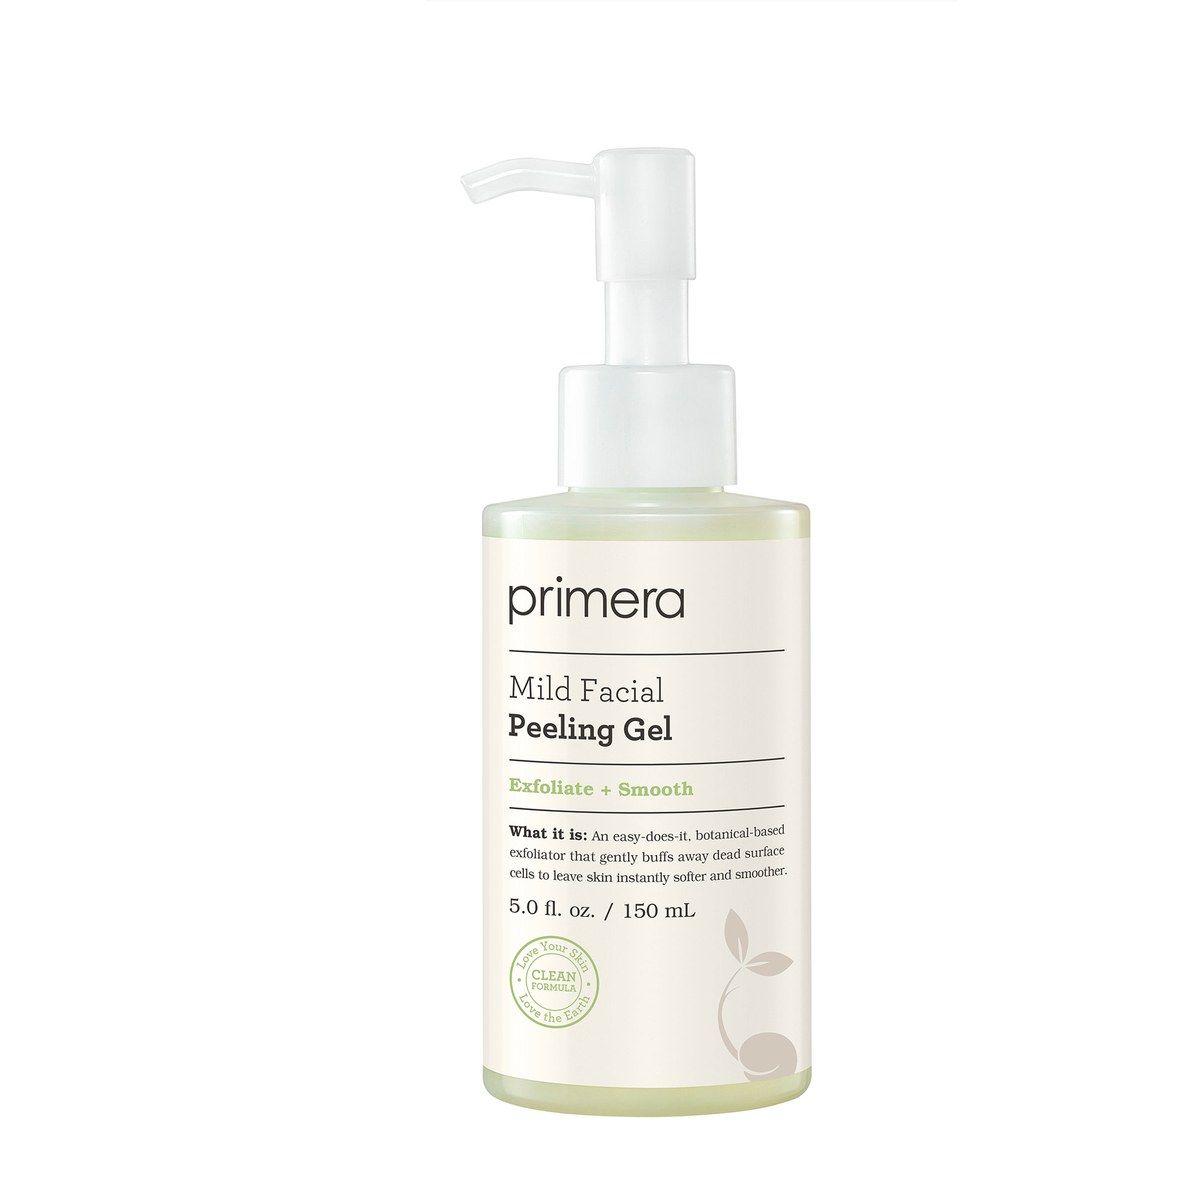 Primera Mild Facial Peeling Gel Sephora Facial Skin Care